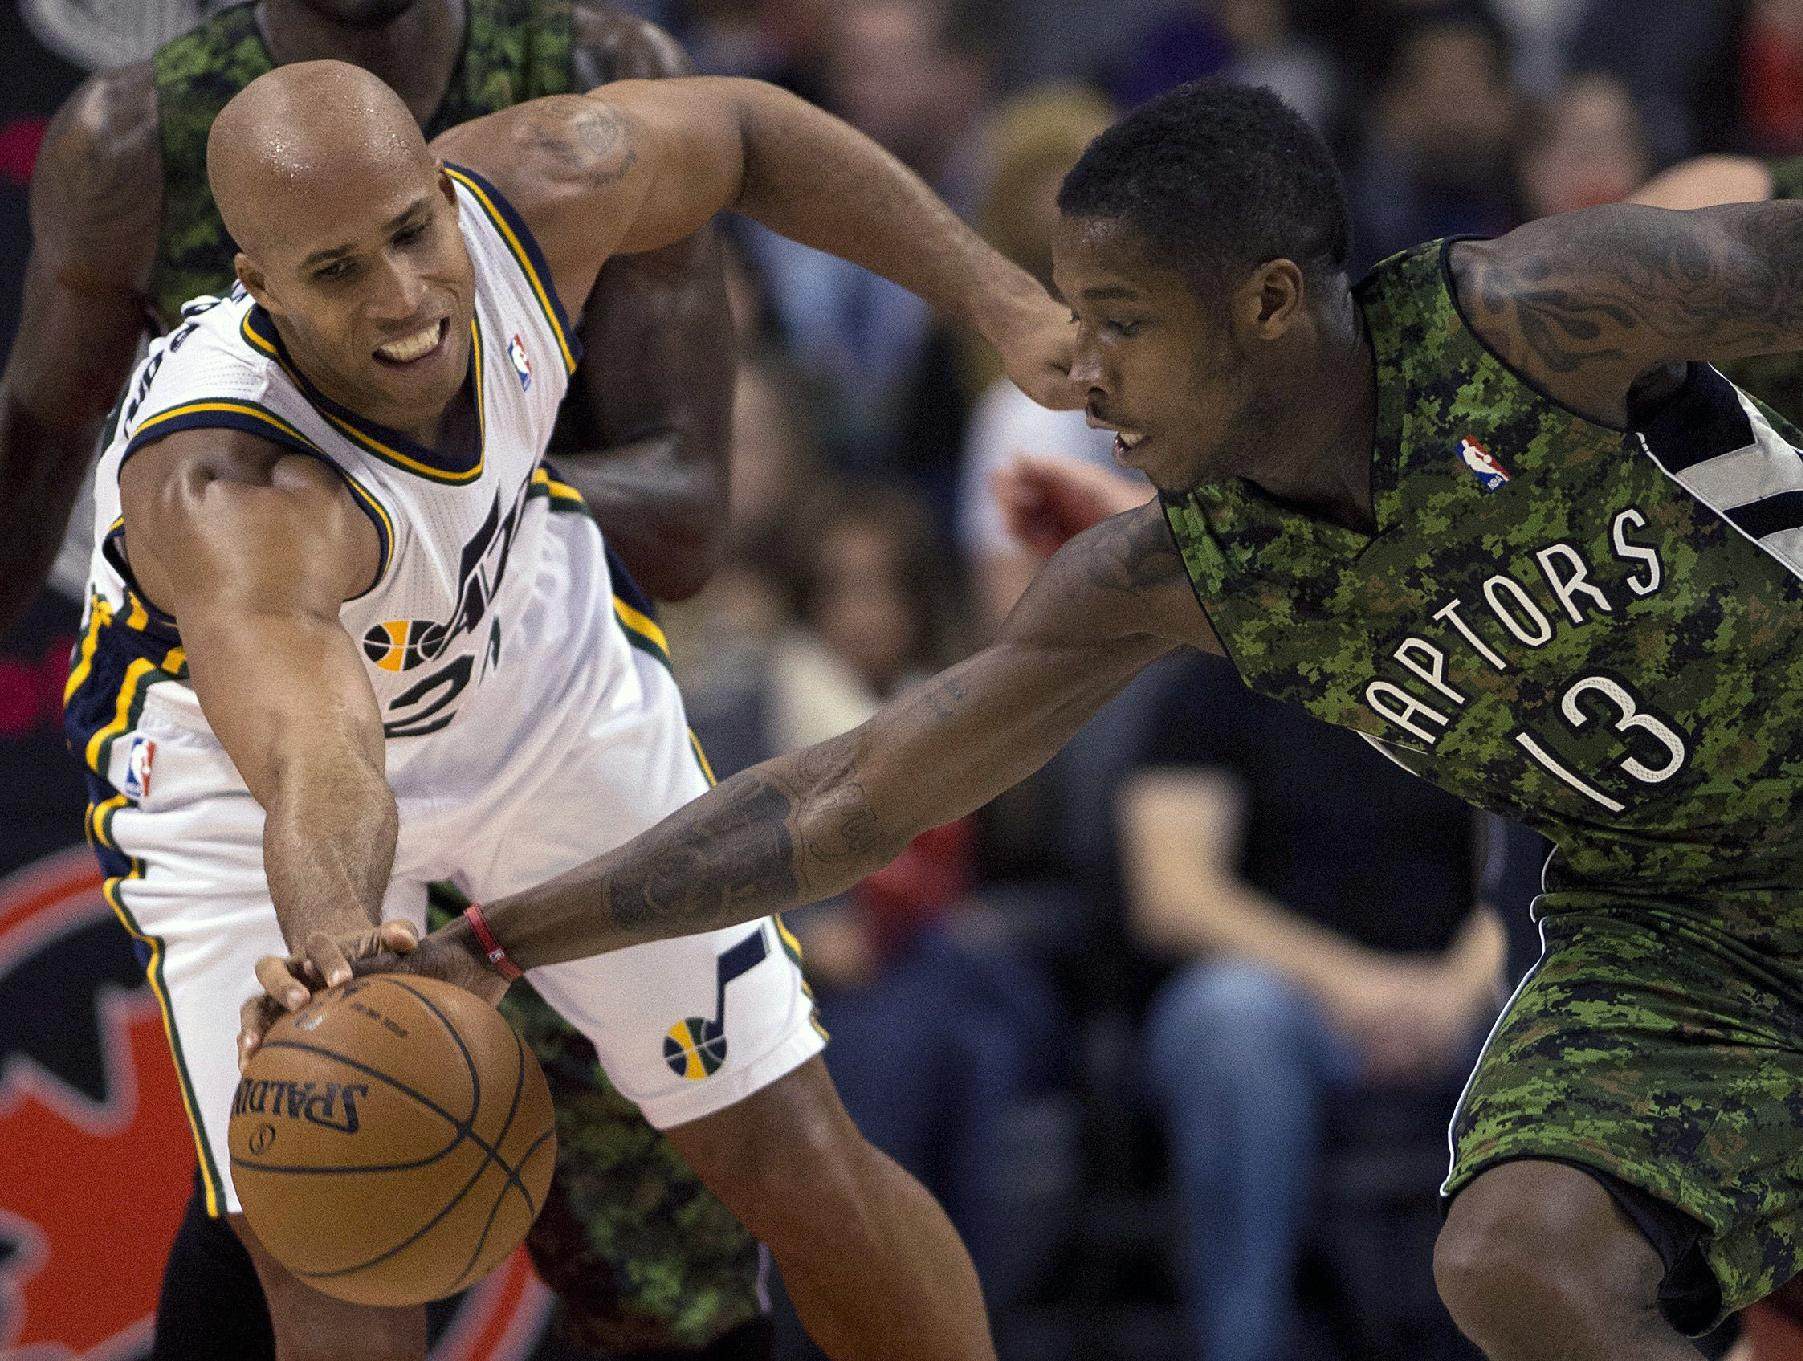 Hansbrough has 23, leads Raptors over winless Jazz